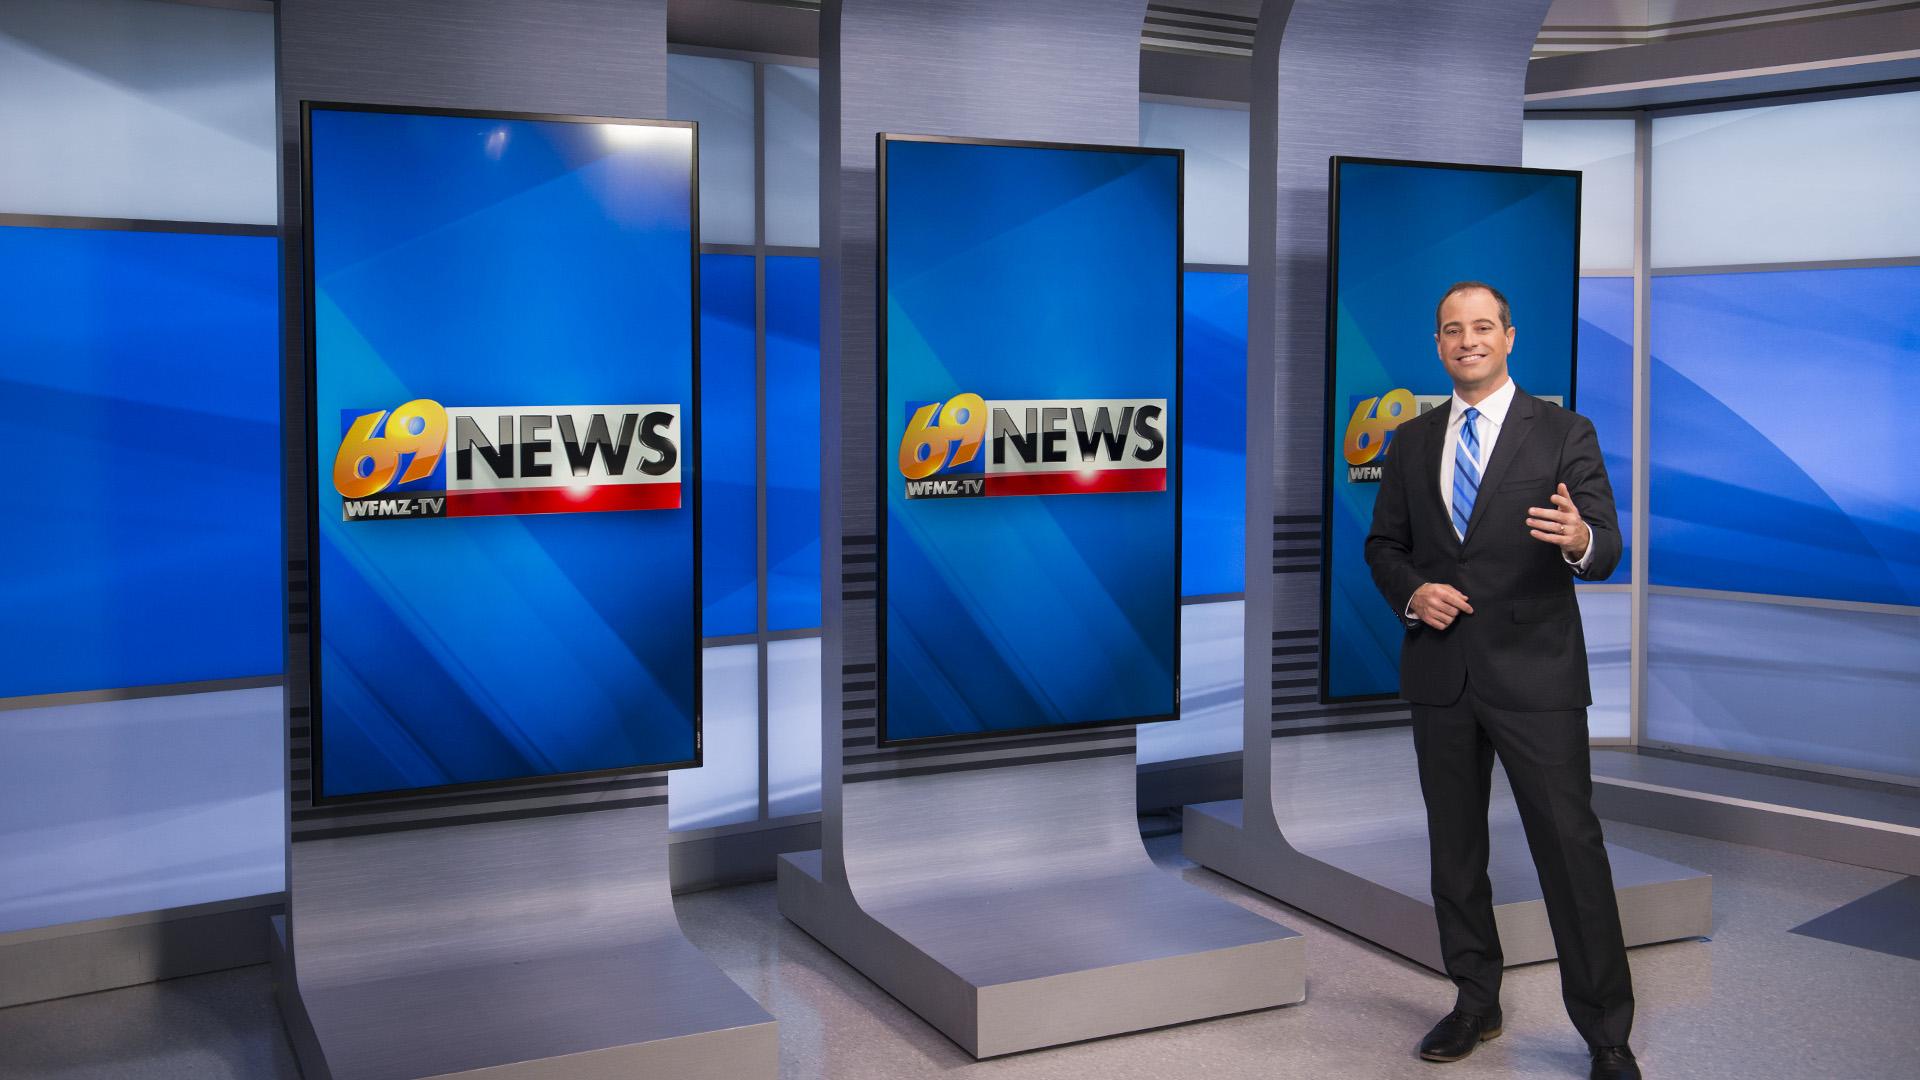 ncs_wfmz-69-news-studio_0010